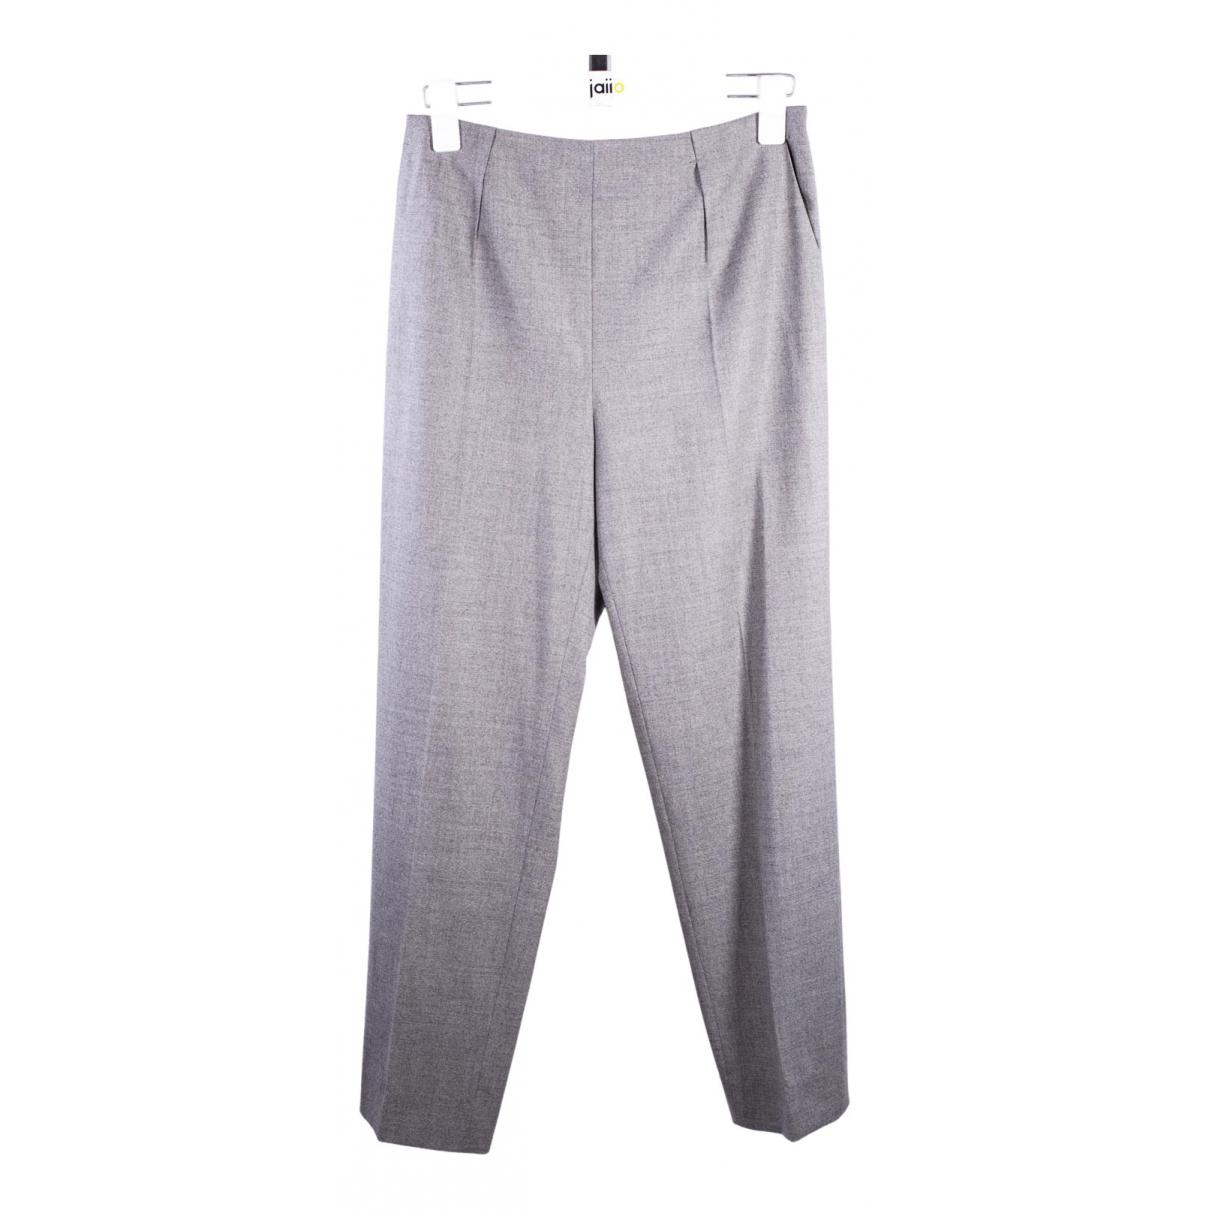 Paule Ka N Grey Wool Trousers for Women 36 FR